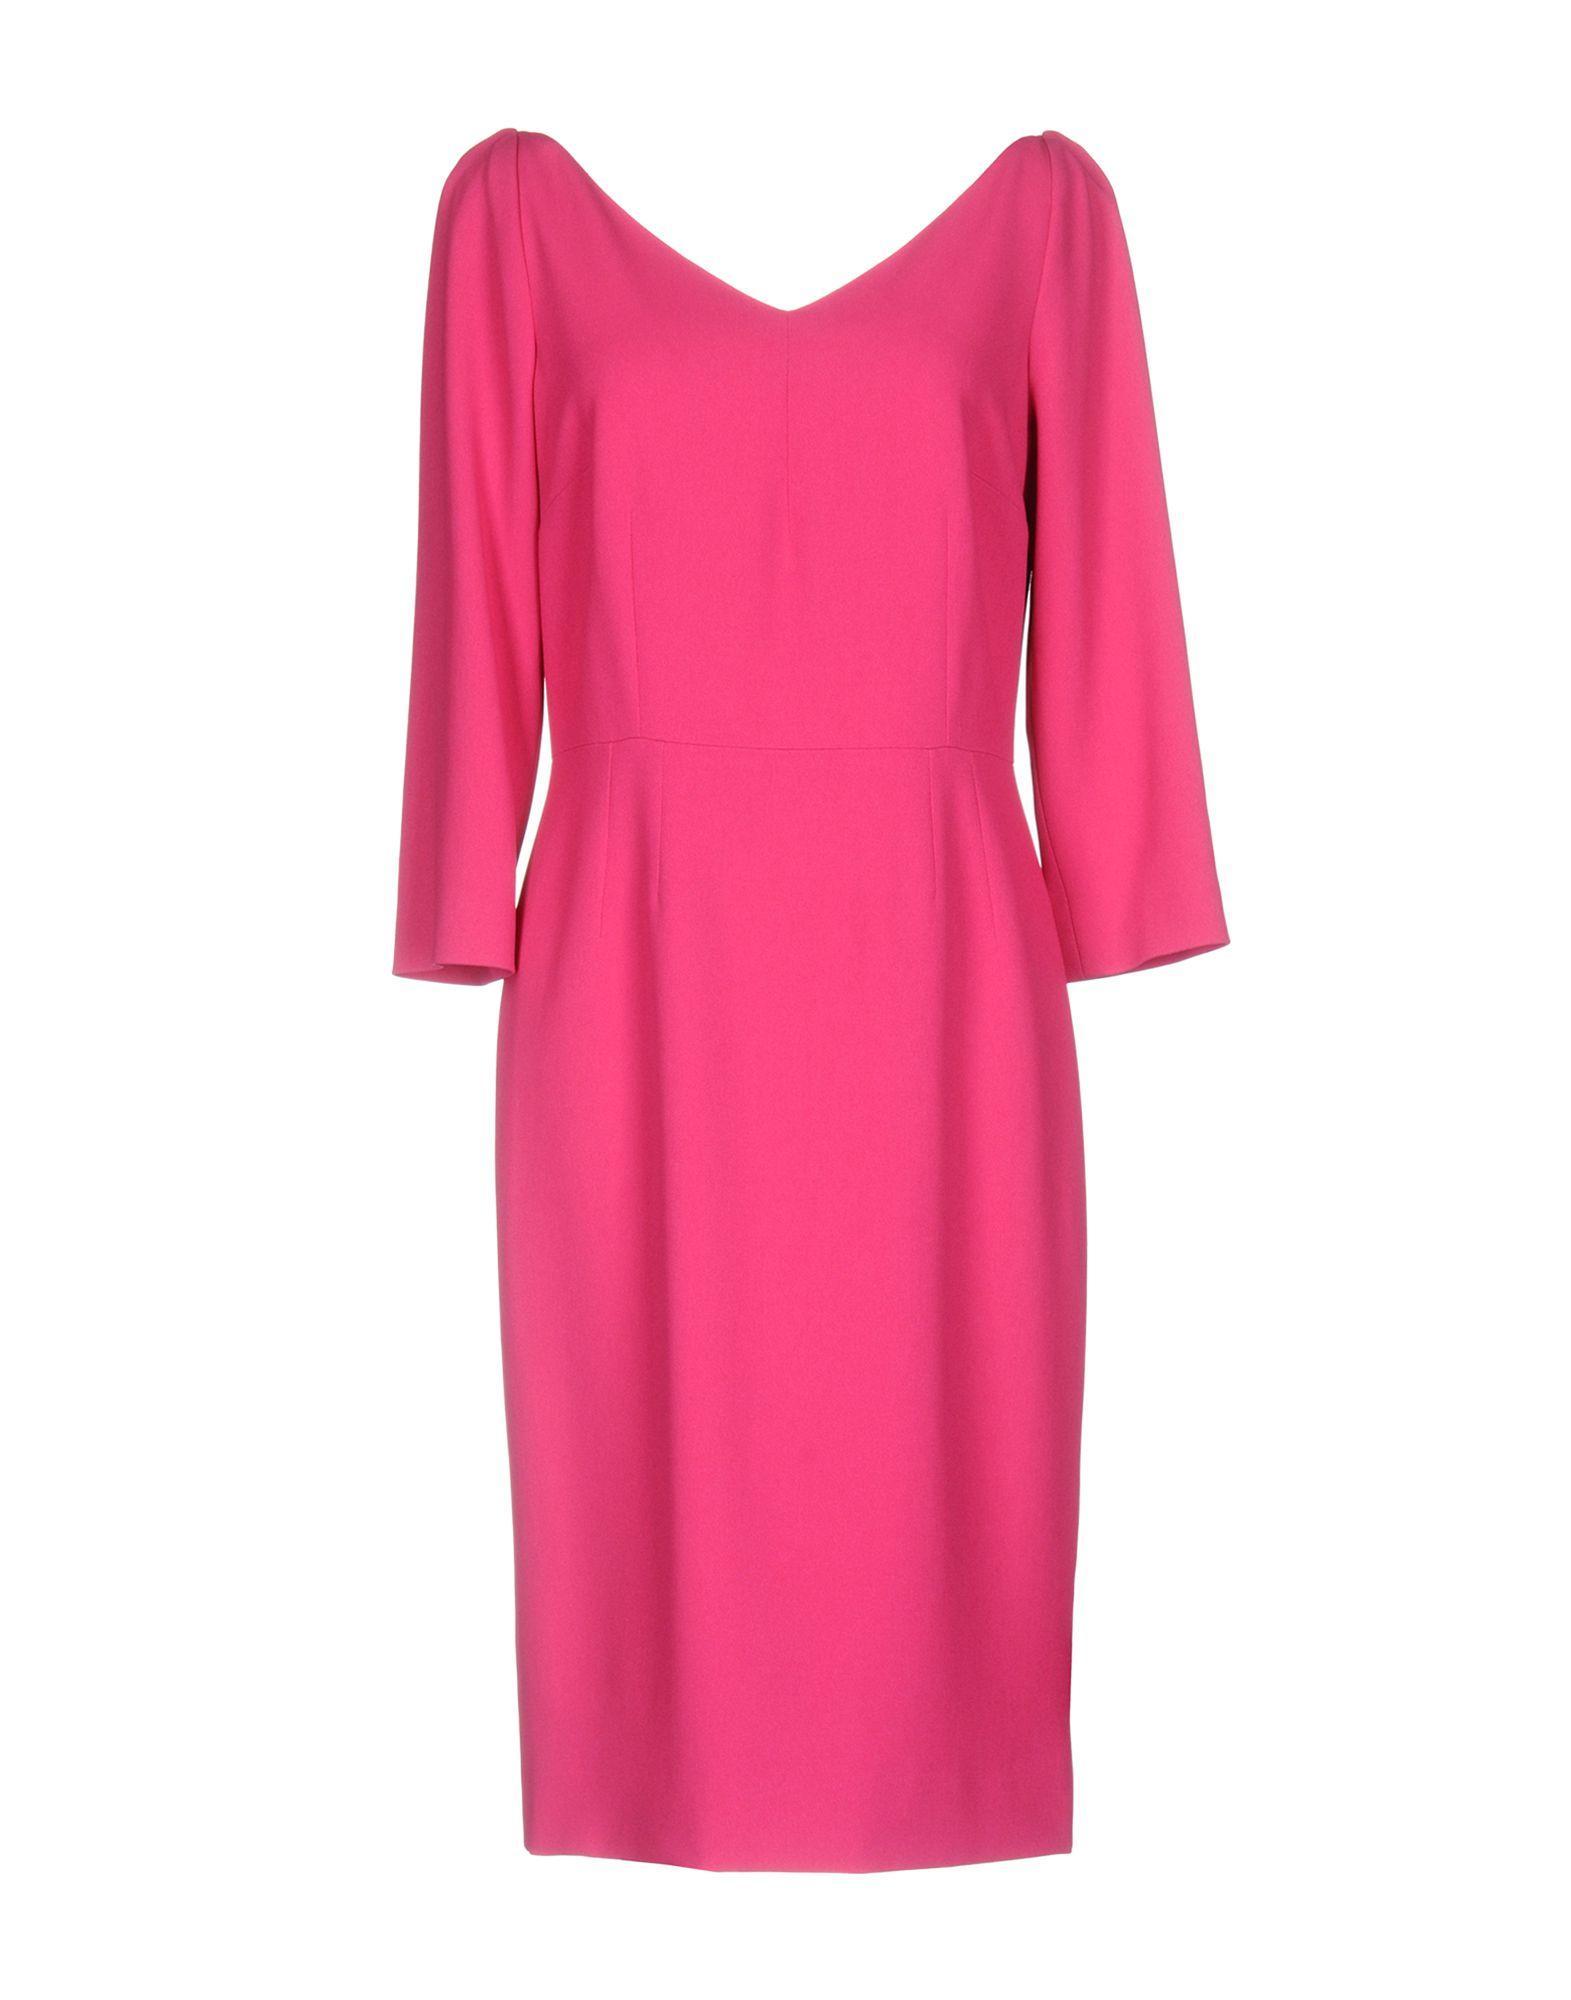 Dolce & Gabbana Knee-Length Dress In Fuchsia